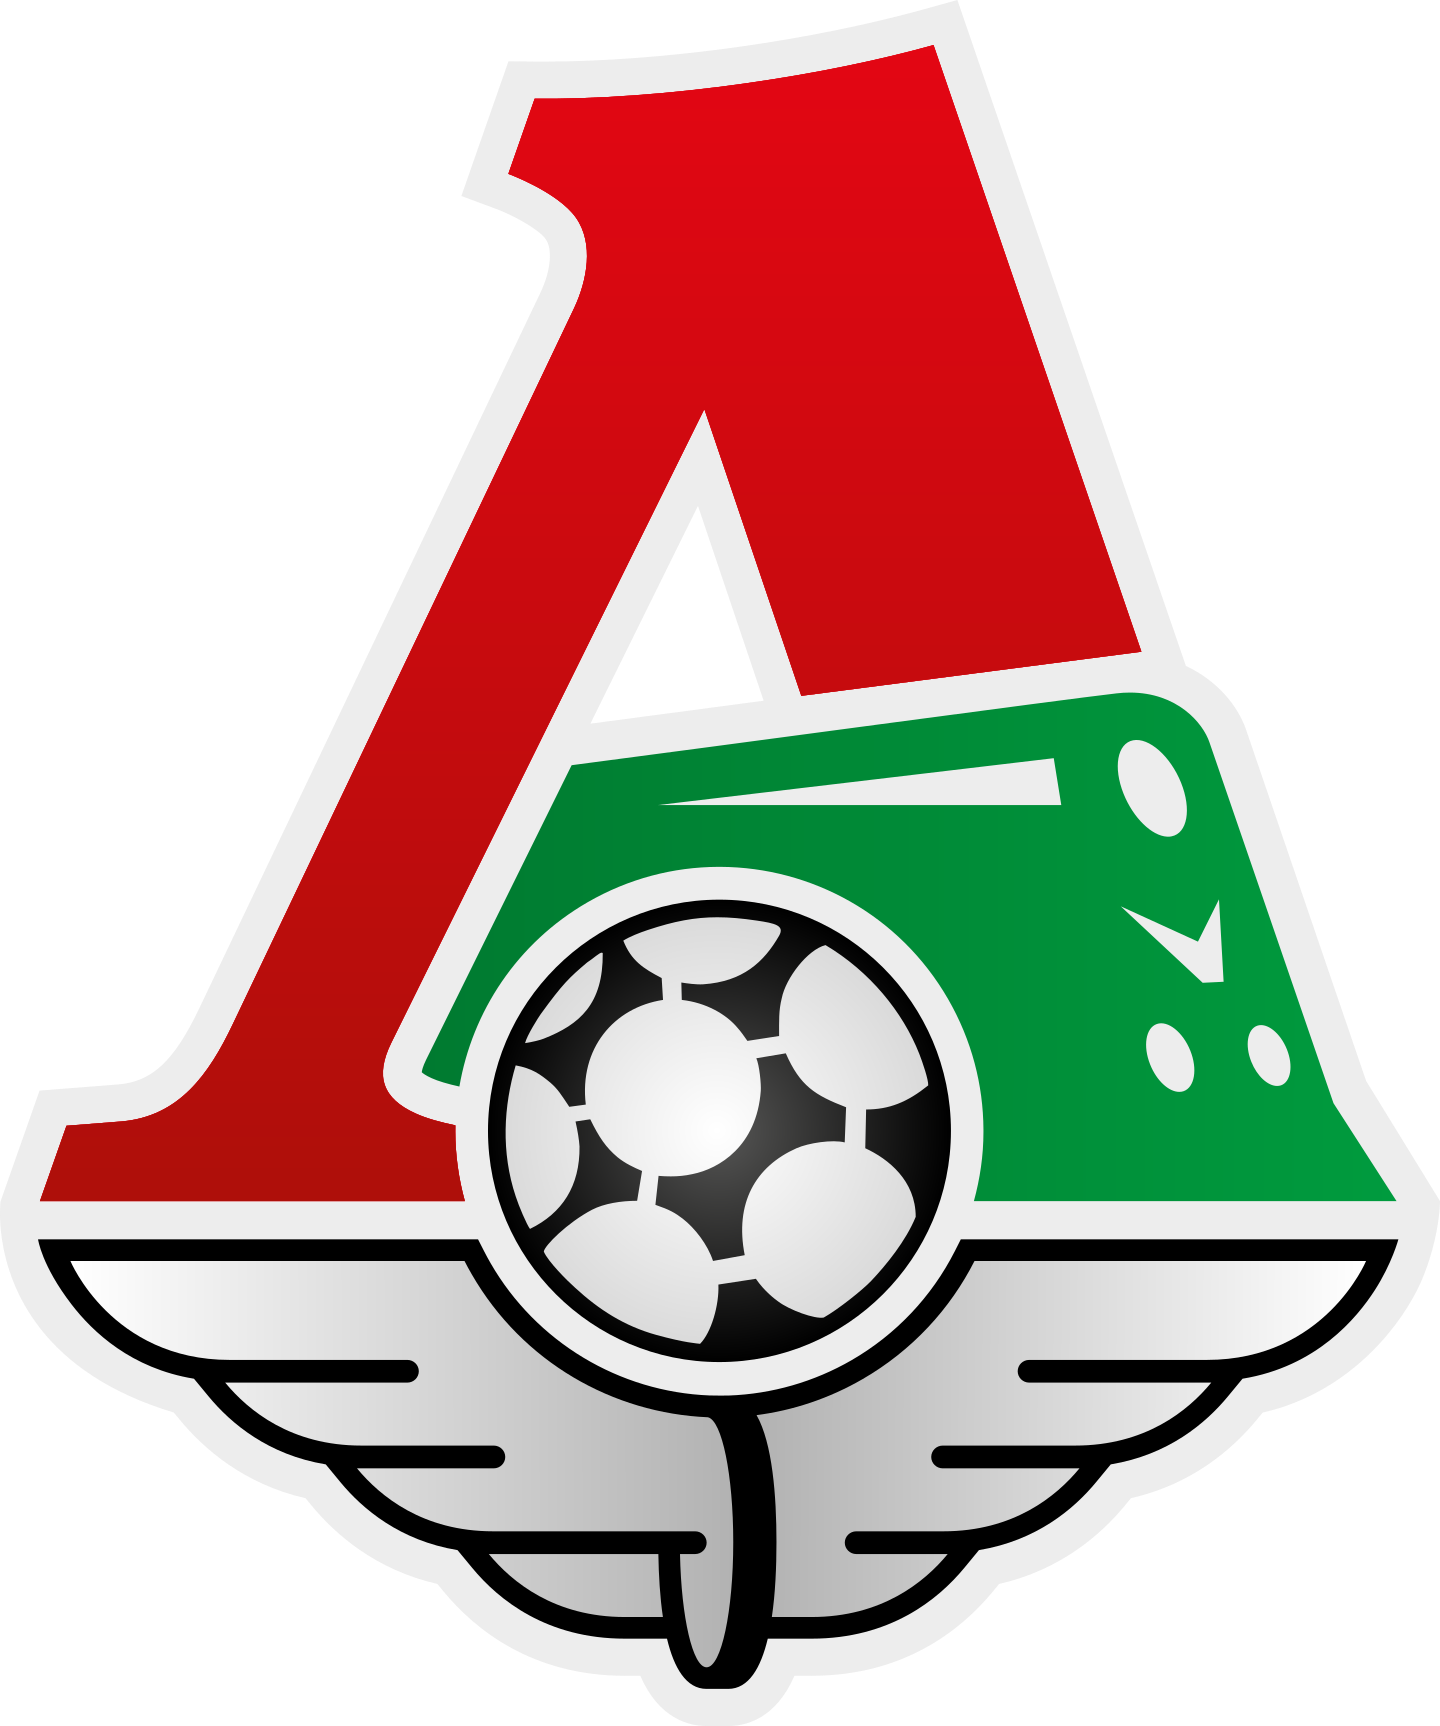 lokomotiv logo 2 - FC Lokomotiv Moscú Logo